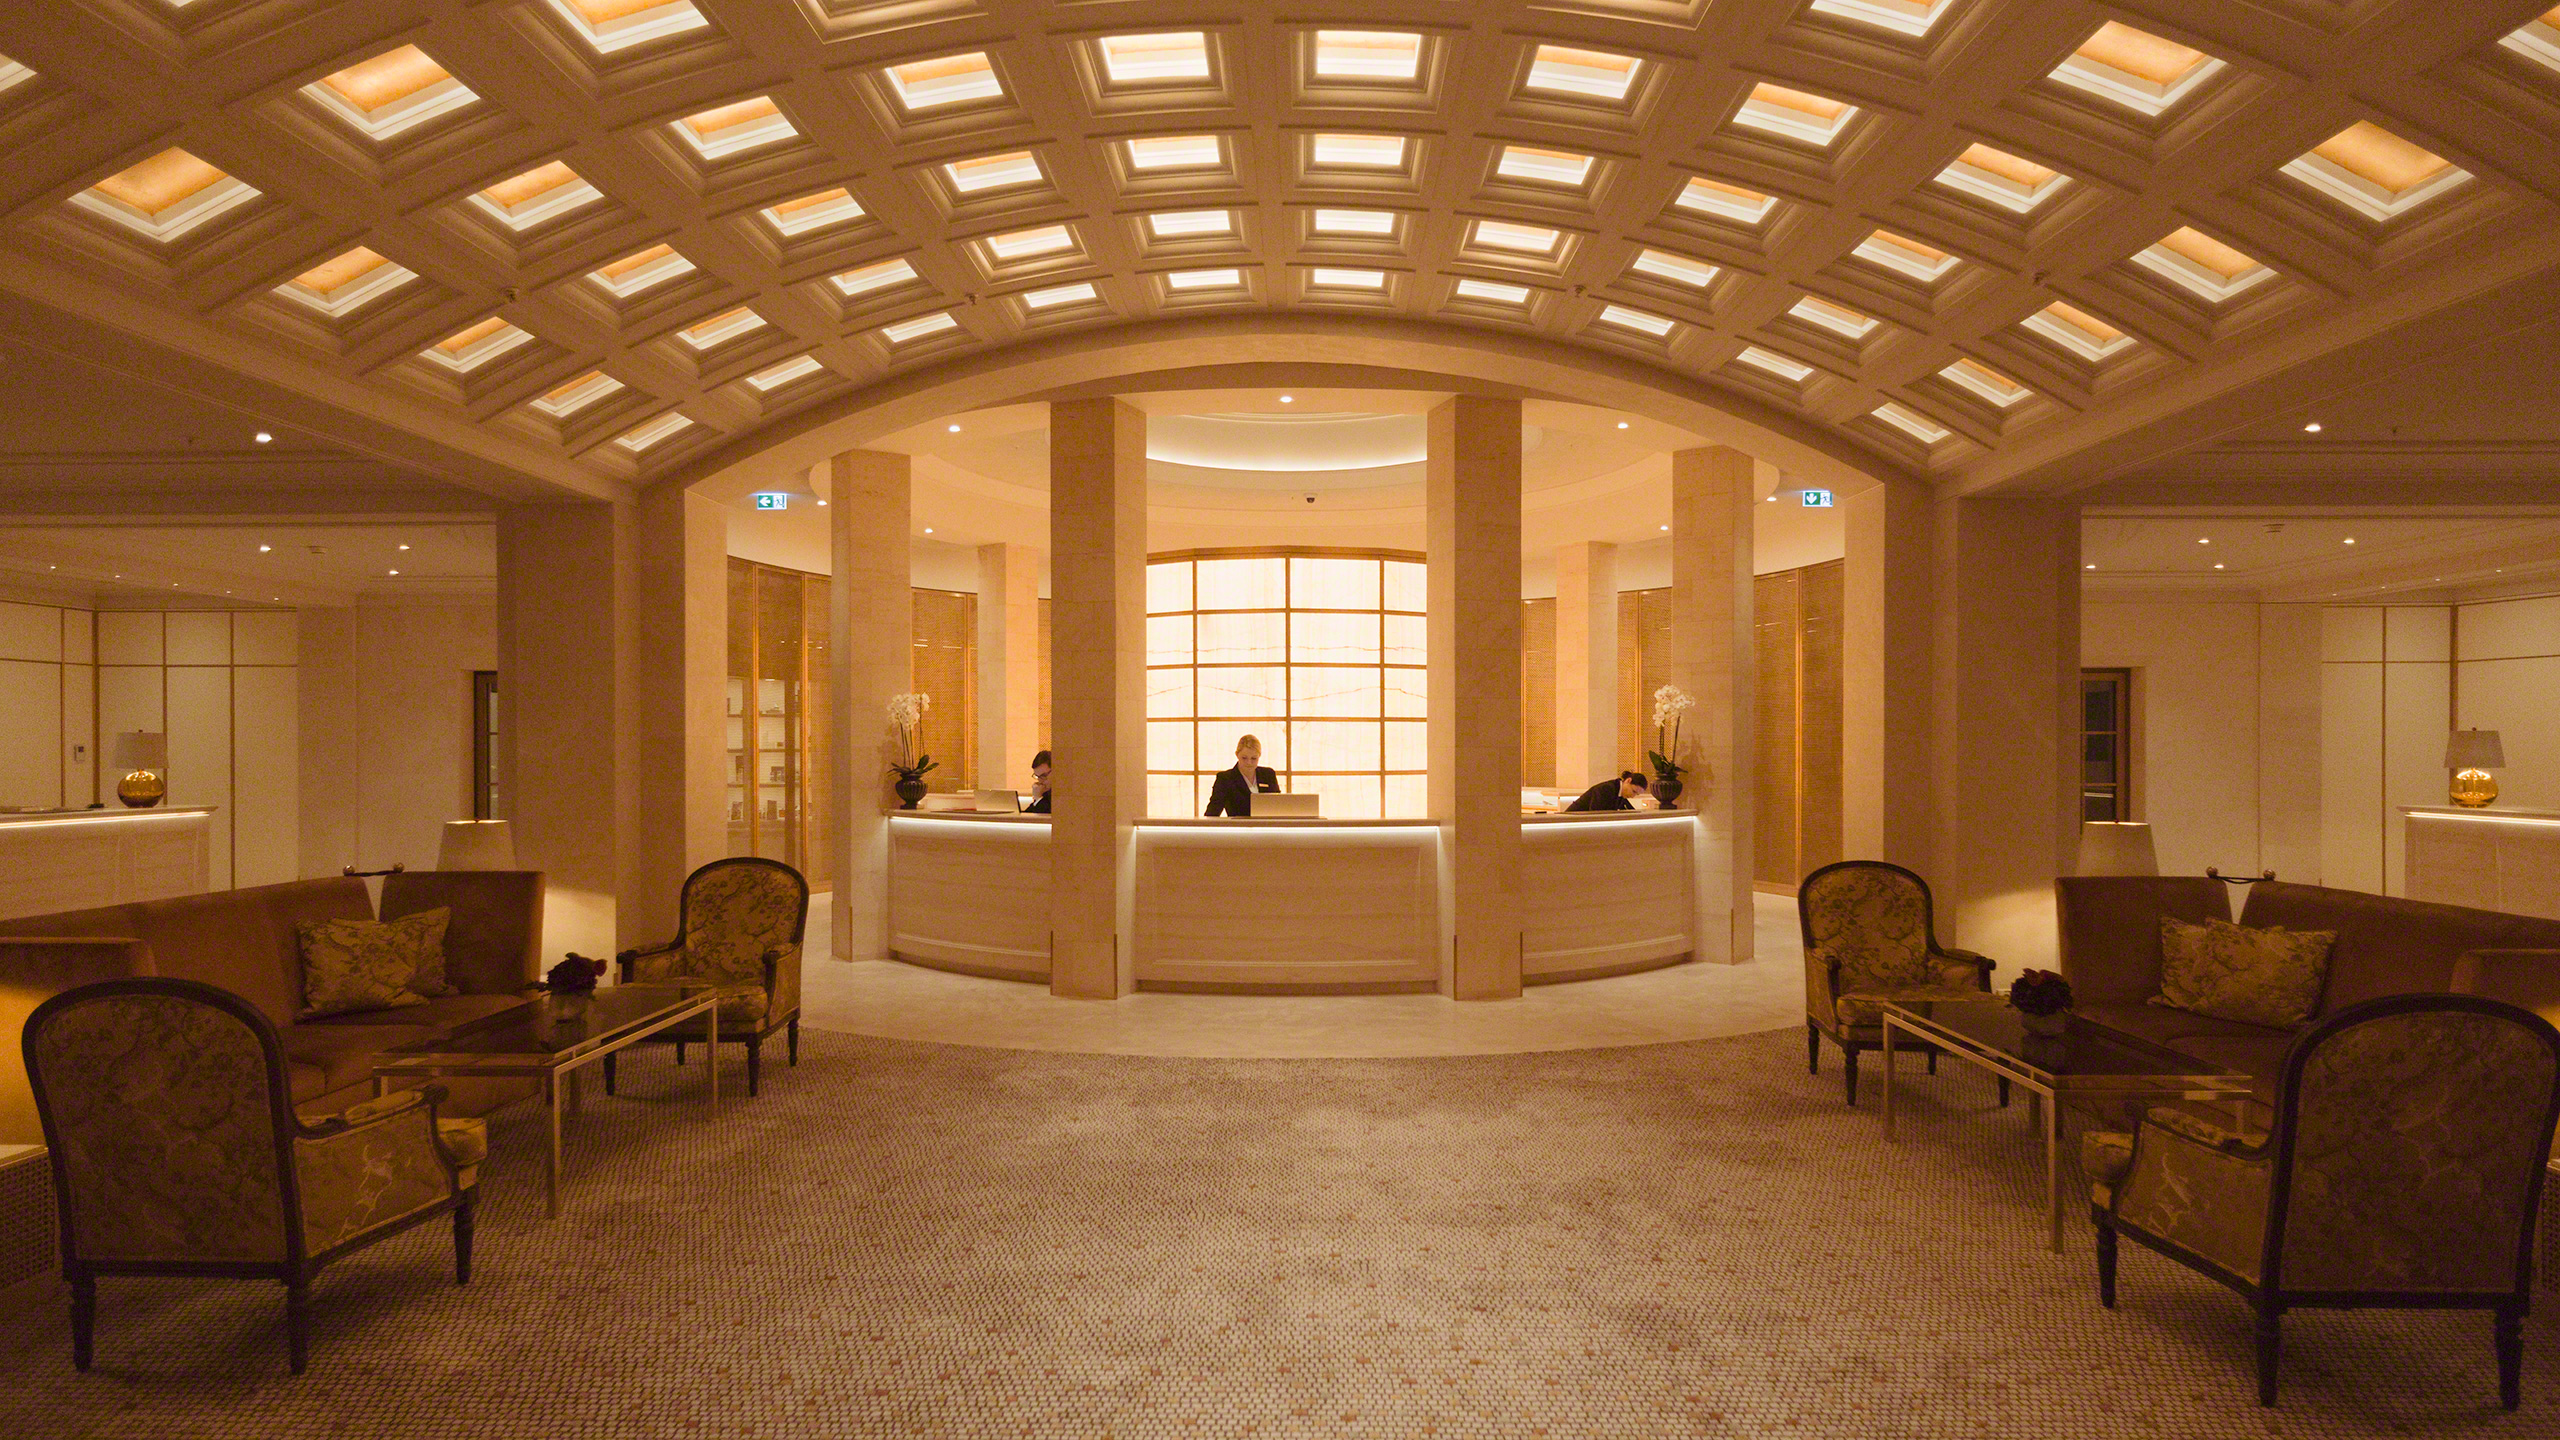 Luxushotel Adlon Kempinski Berlin Empfang